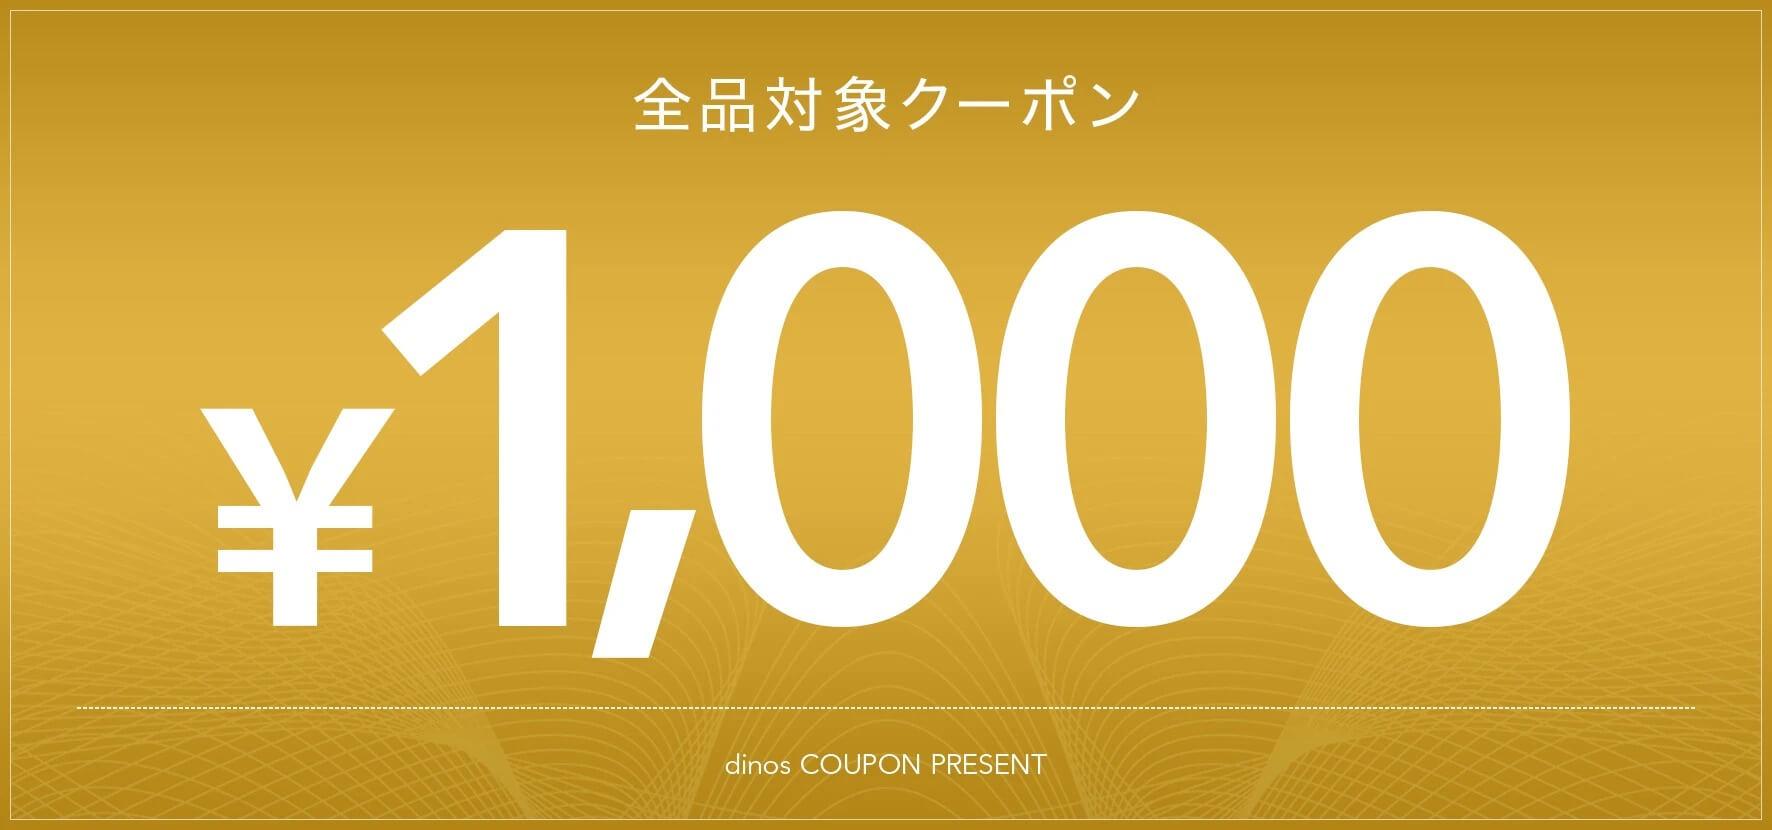 dinos(ディノス)1,000円割引クーポンキャンペーン